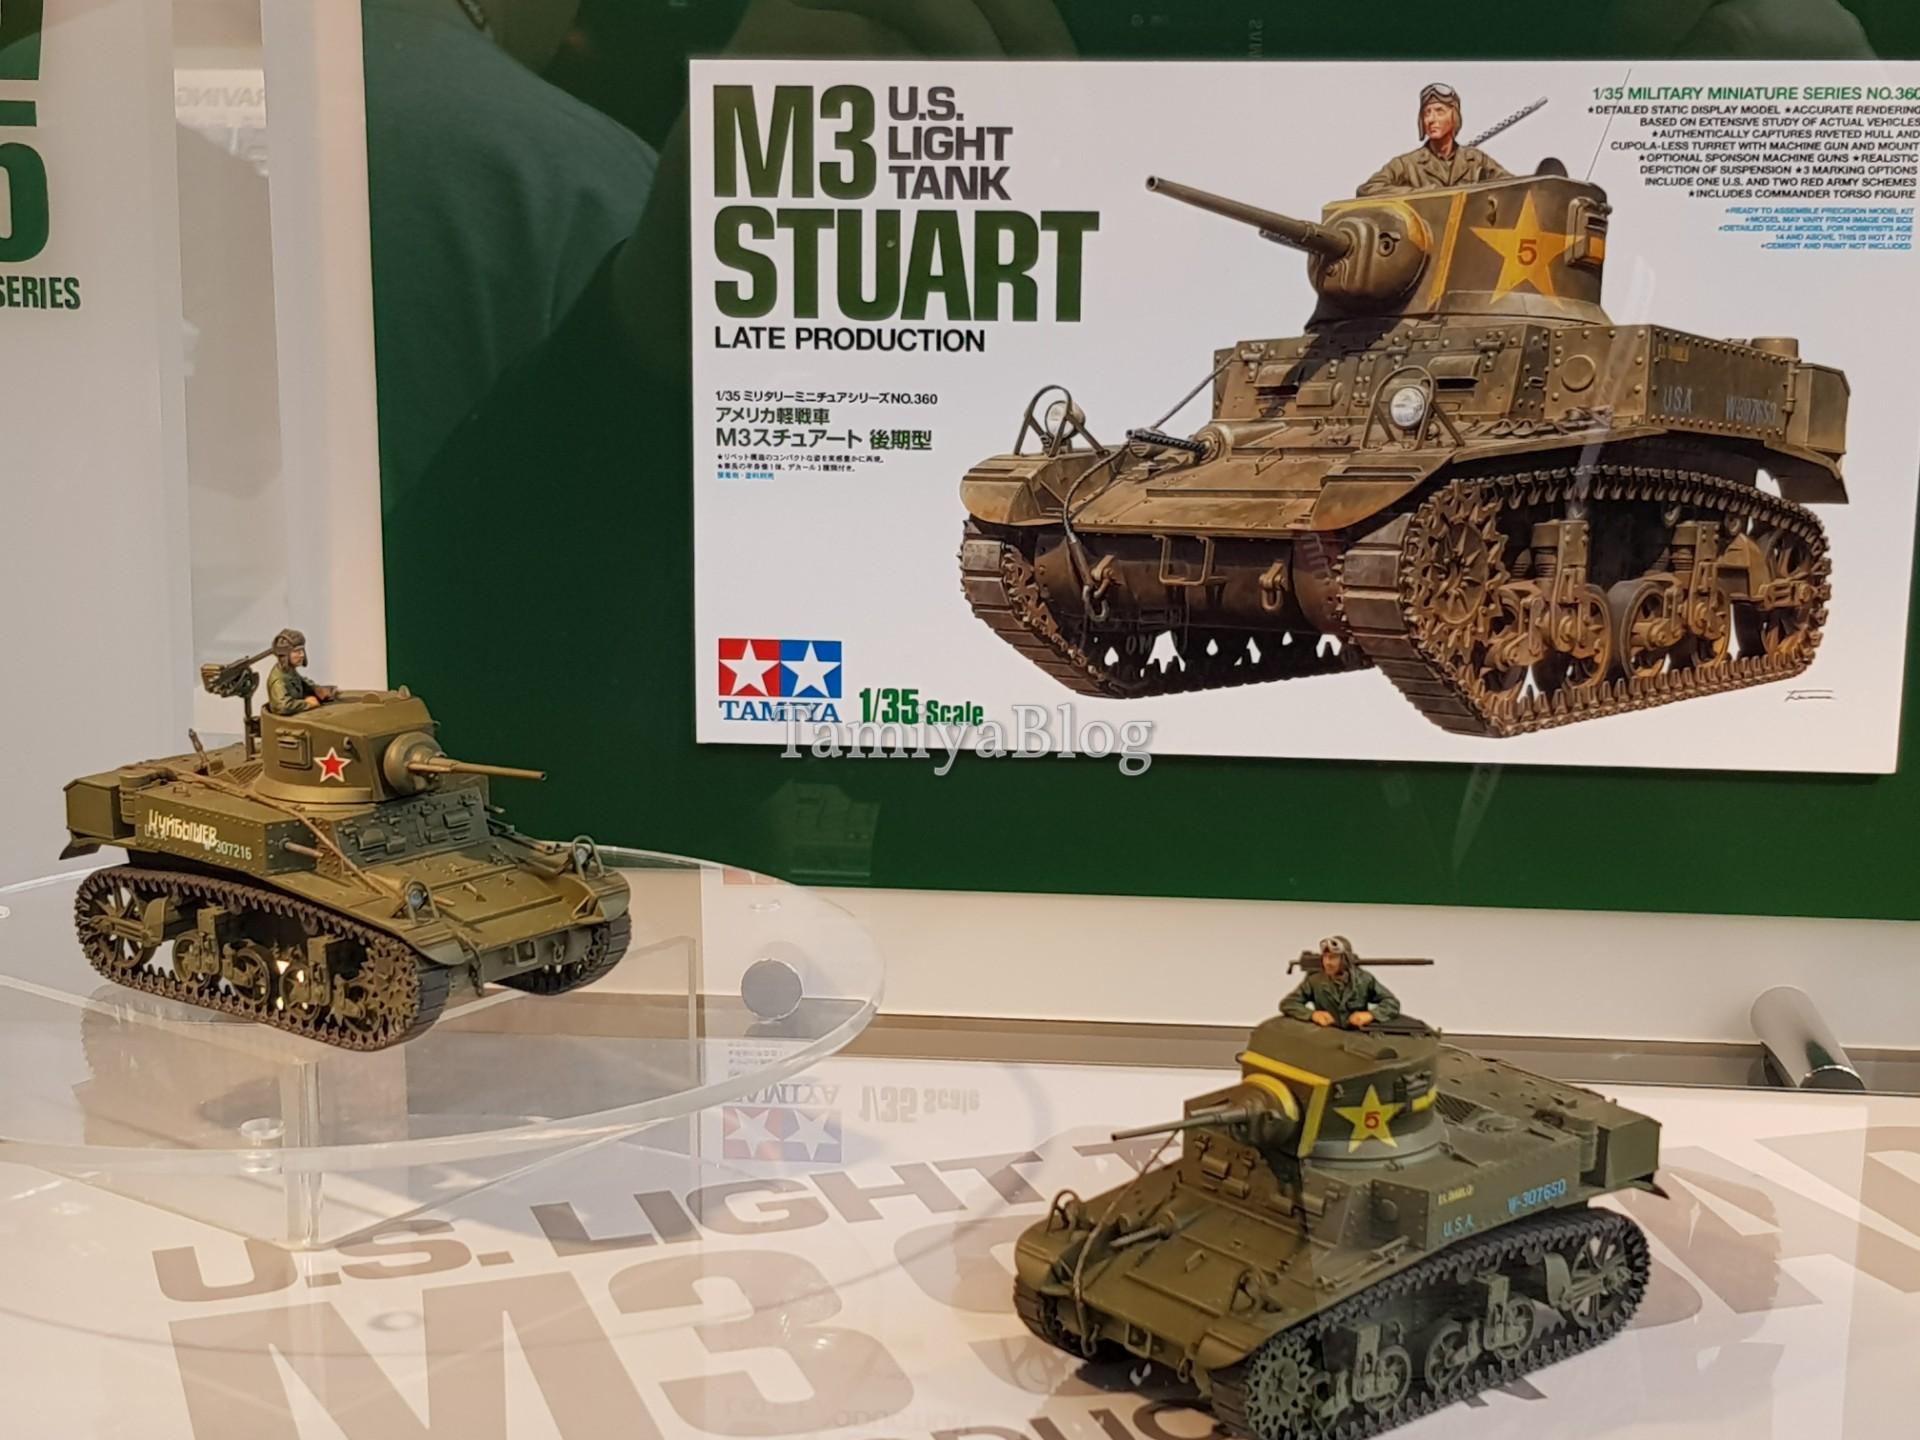 Tamiya 35360 1/35 U.S. LIGHT TANK M3 STUART LATE PRODUCTION @ Nuremberg Toy  Fair 2018